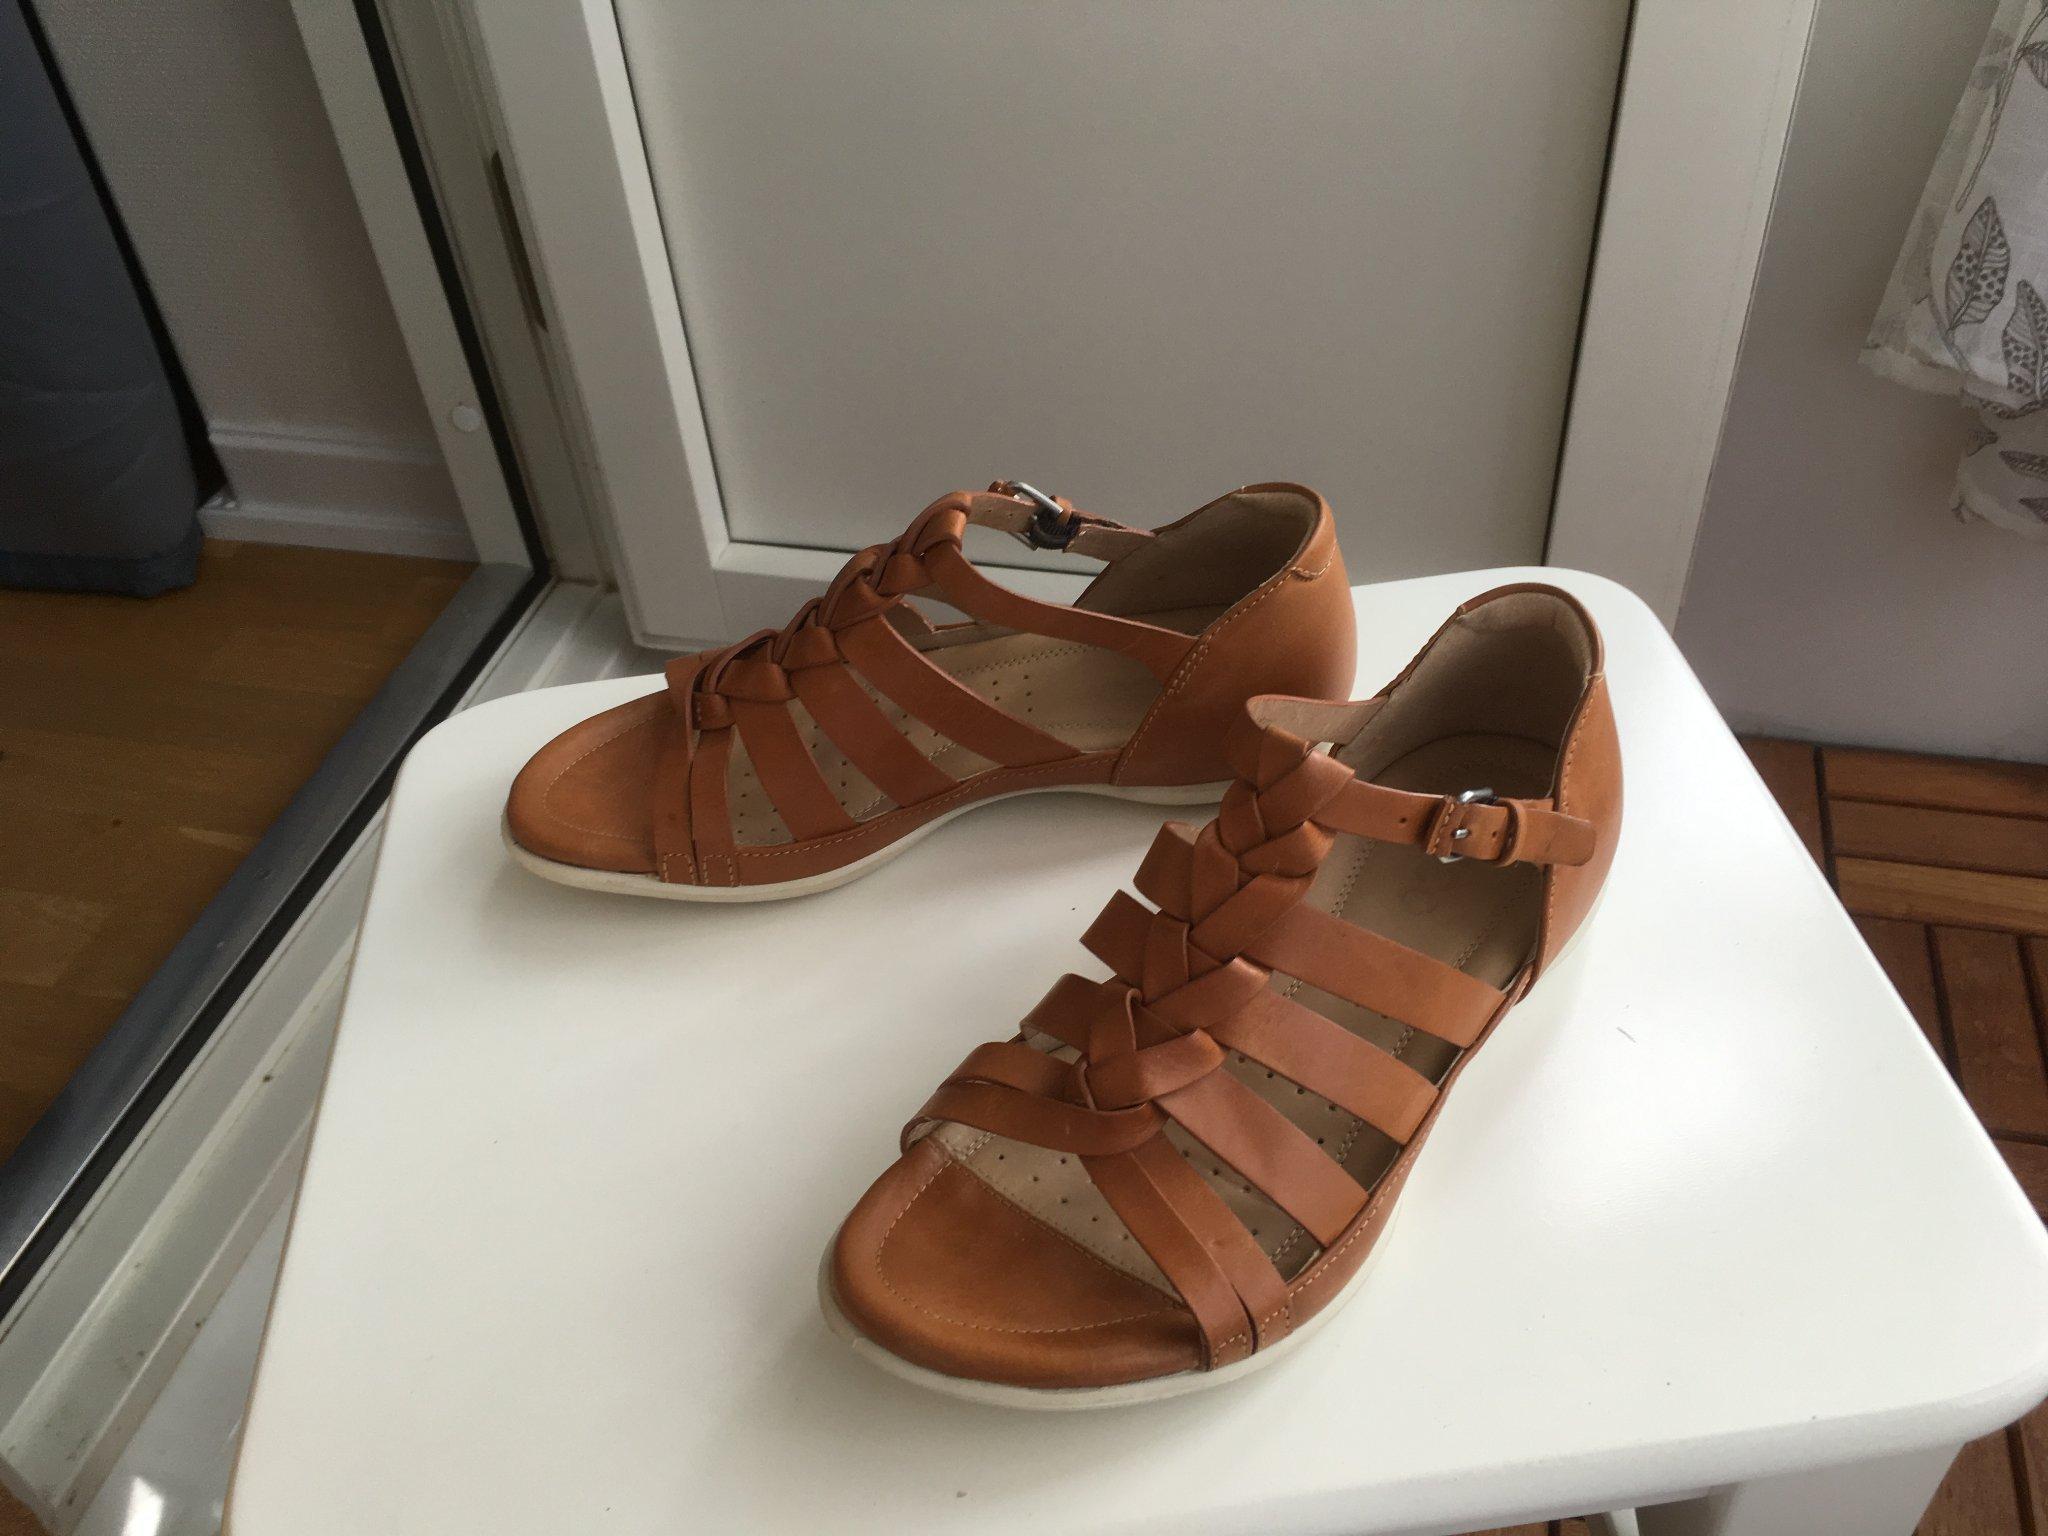 6c3e197a752 Ecco sandal i skinn, strl:36 (347254644) ᐈ Köp på Tradera